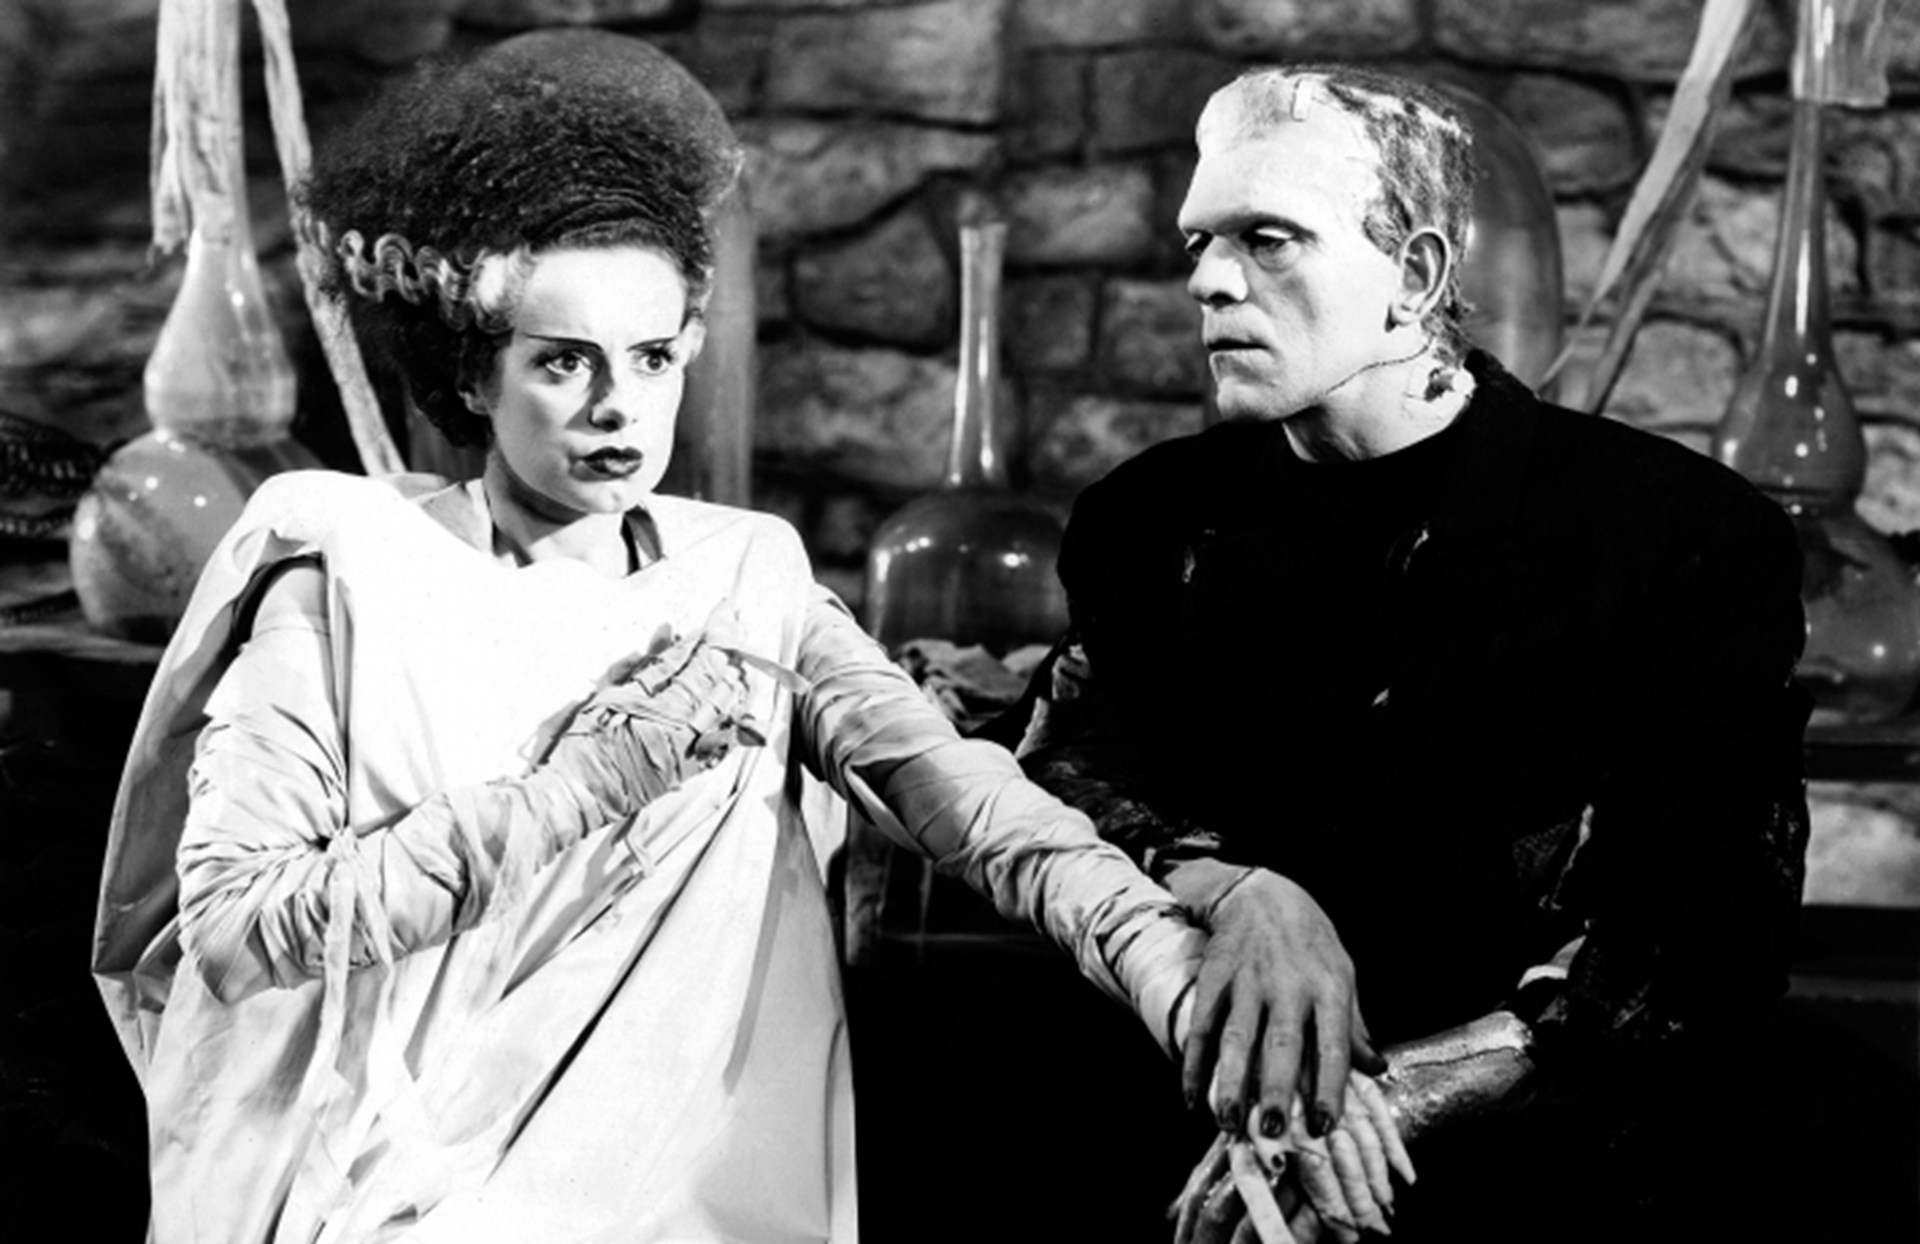 The brilliance of the original frankenstein films